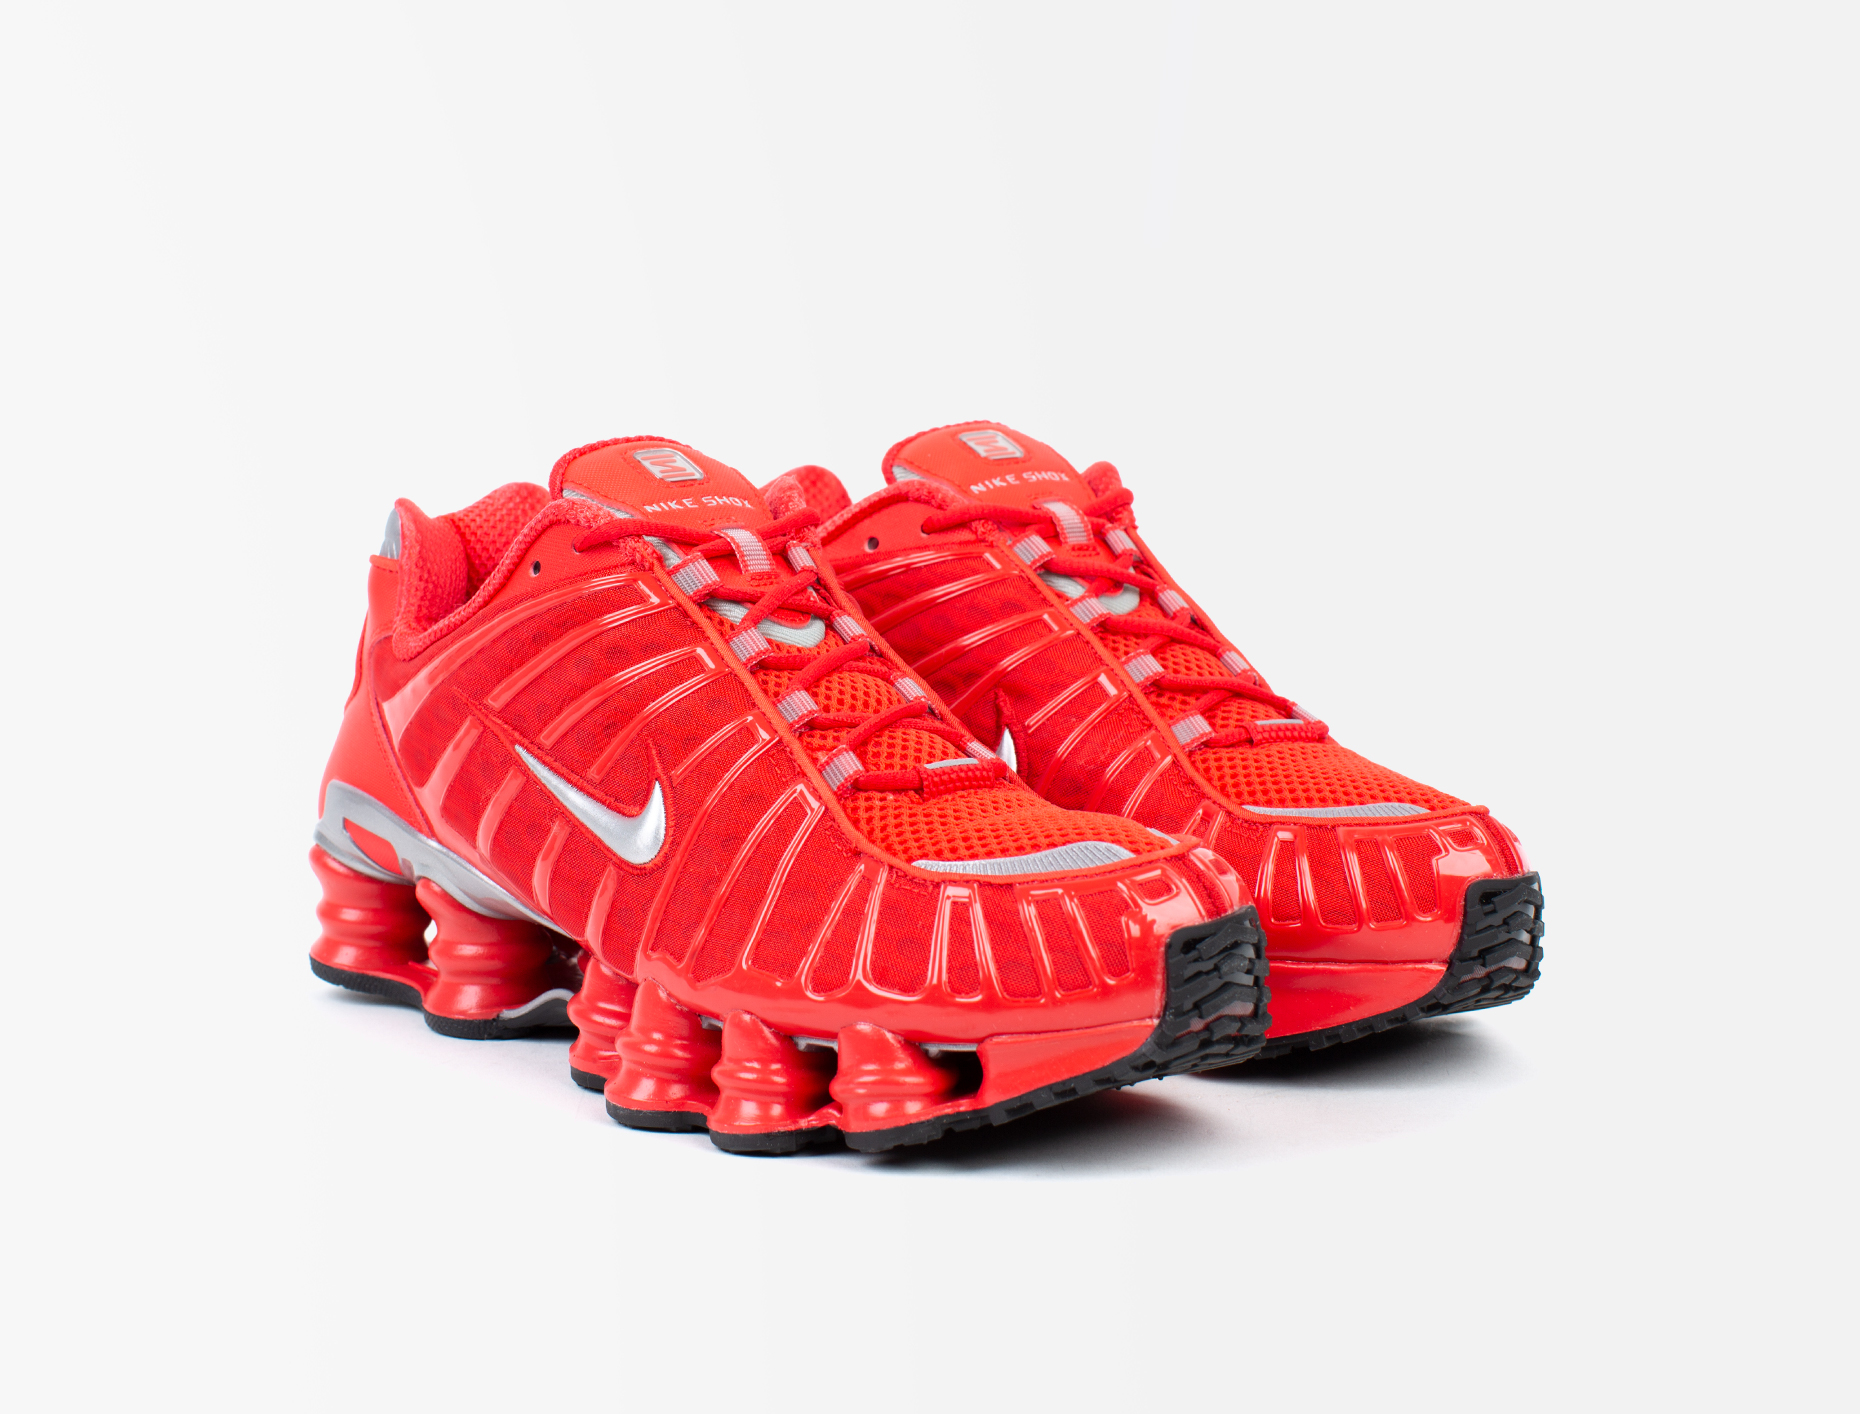 b09c9cd344b6a Nike Nike Shox TL Sneaker | Voo Store Berlin | Worldwide Shipping